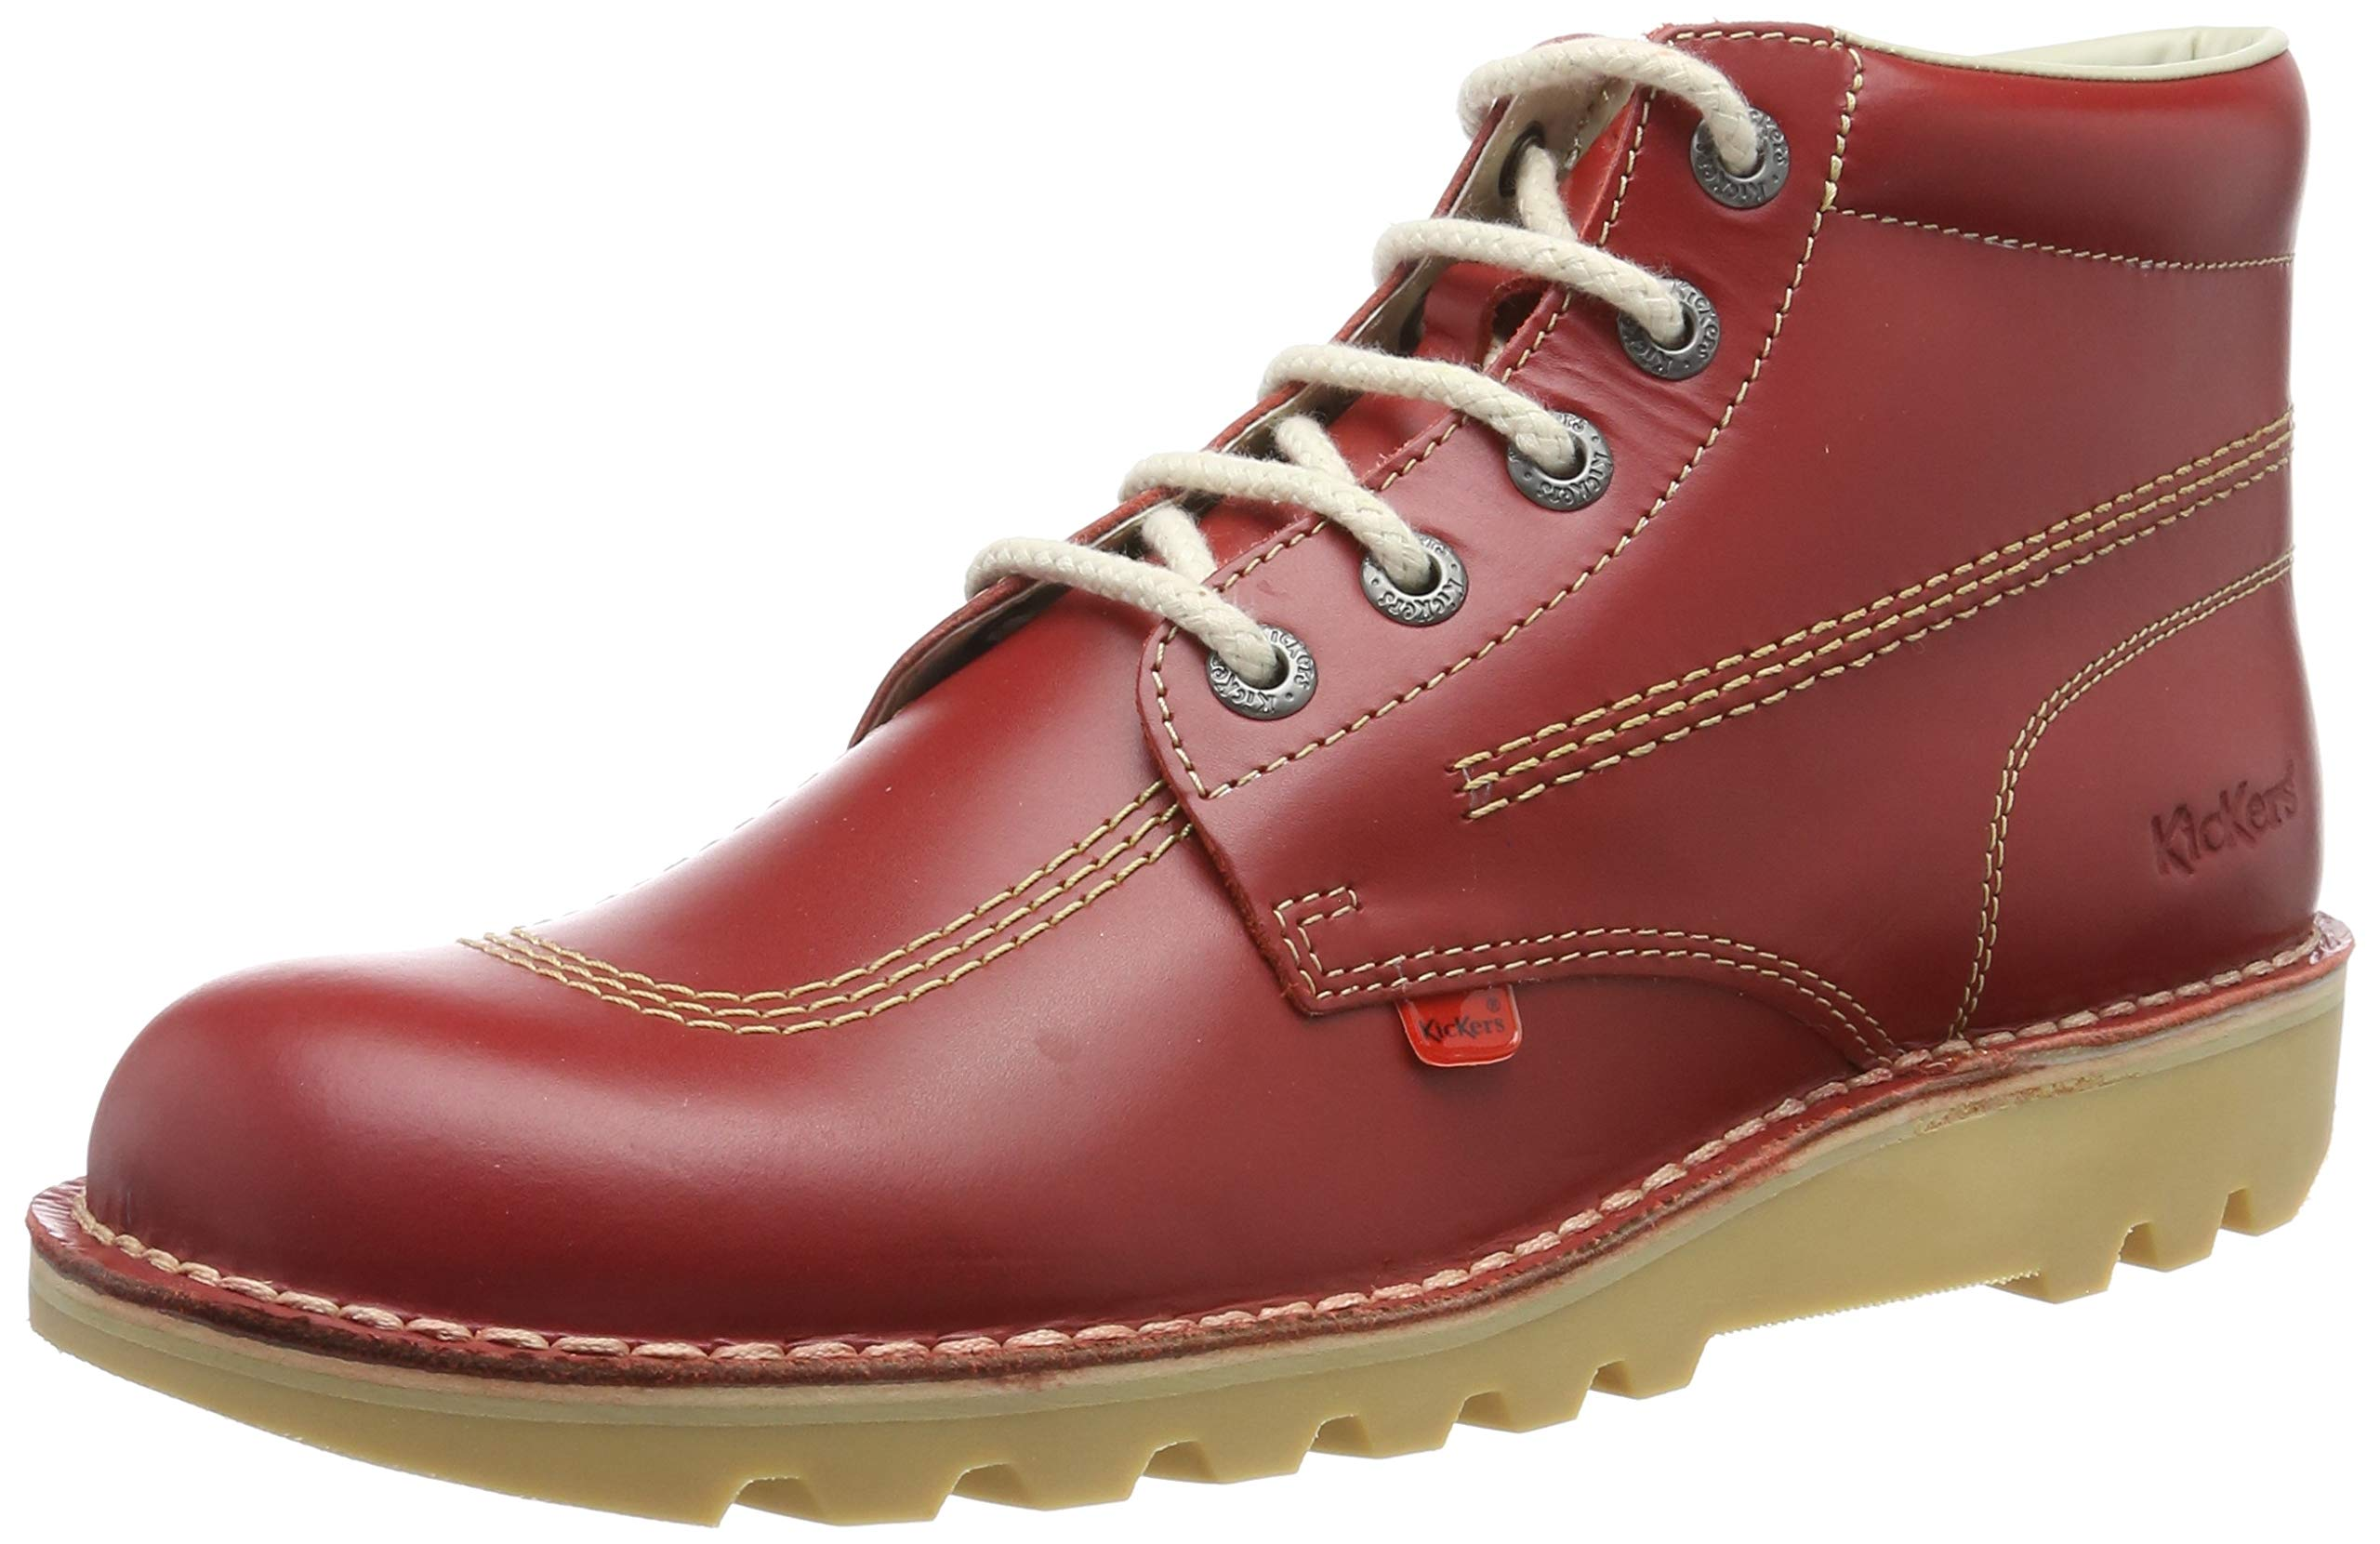 Eu Classiques Red47 HiBottesamp; Kickers HommeRouge Bottines A3Rjq5L4